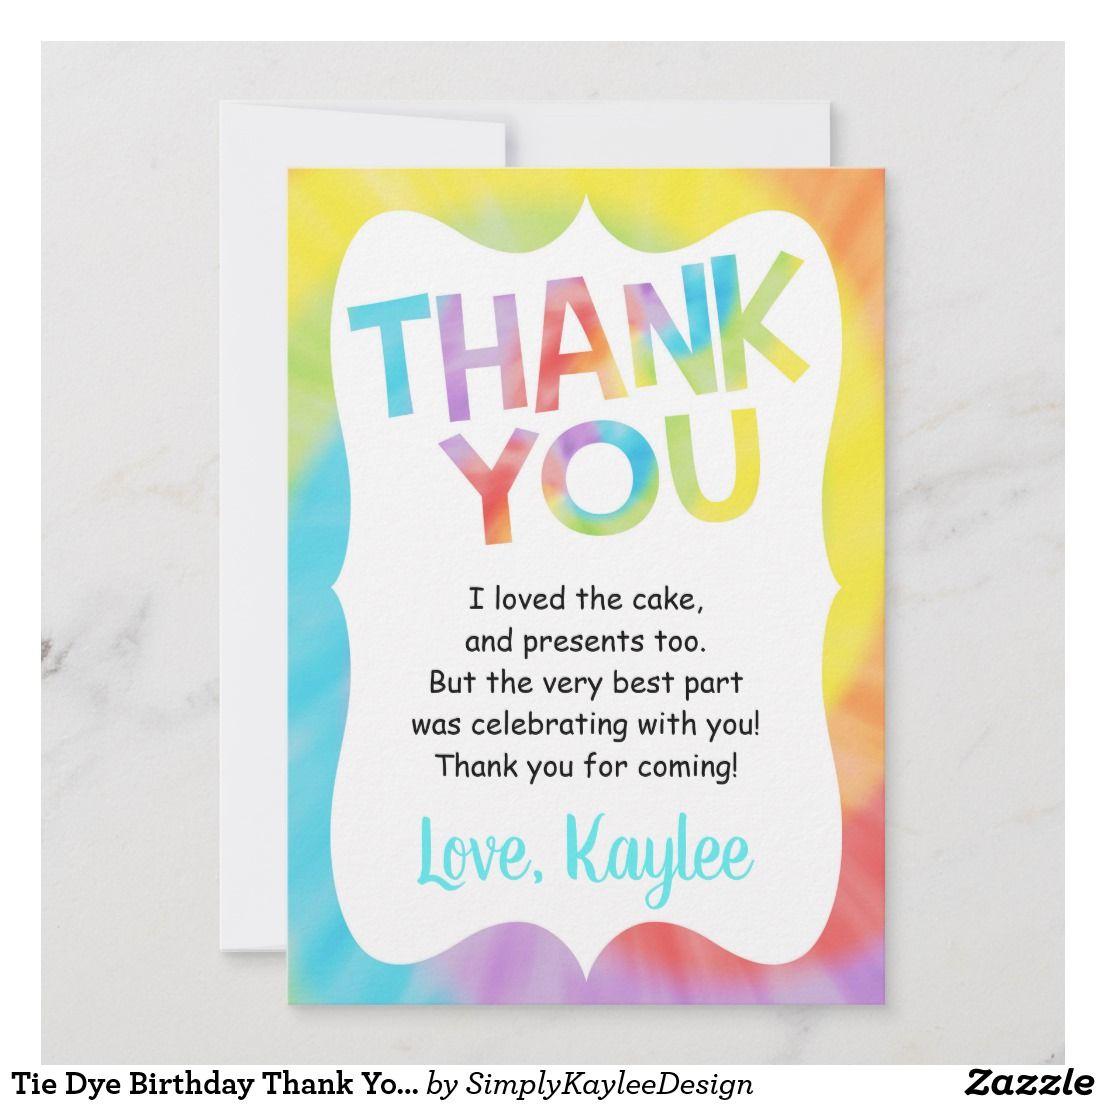 Tie Dye Birthday Thank You Card Custom Holiday Card Tie Dye Birthday Tie Dye Birthday Party